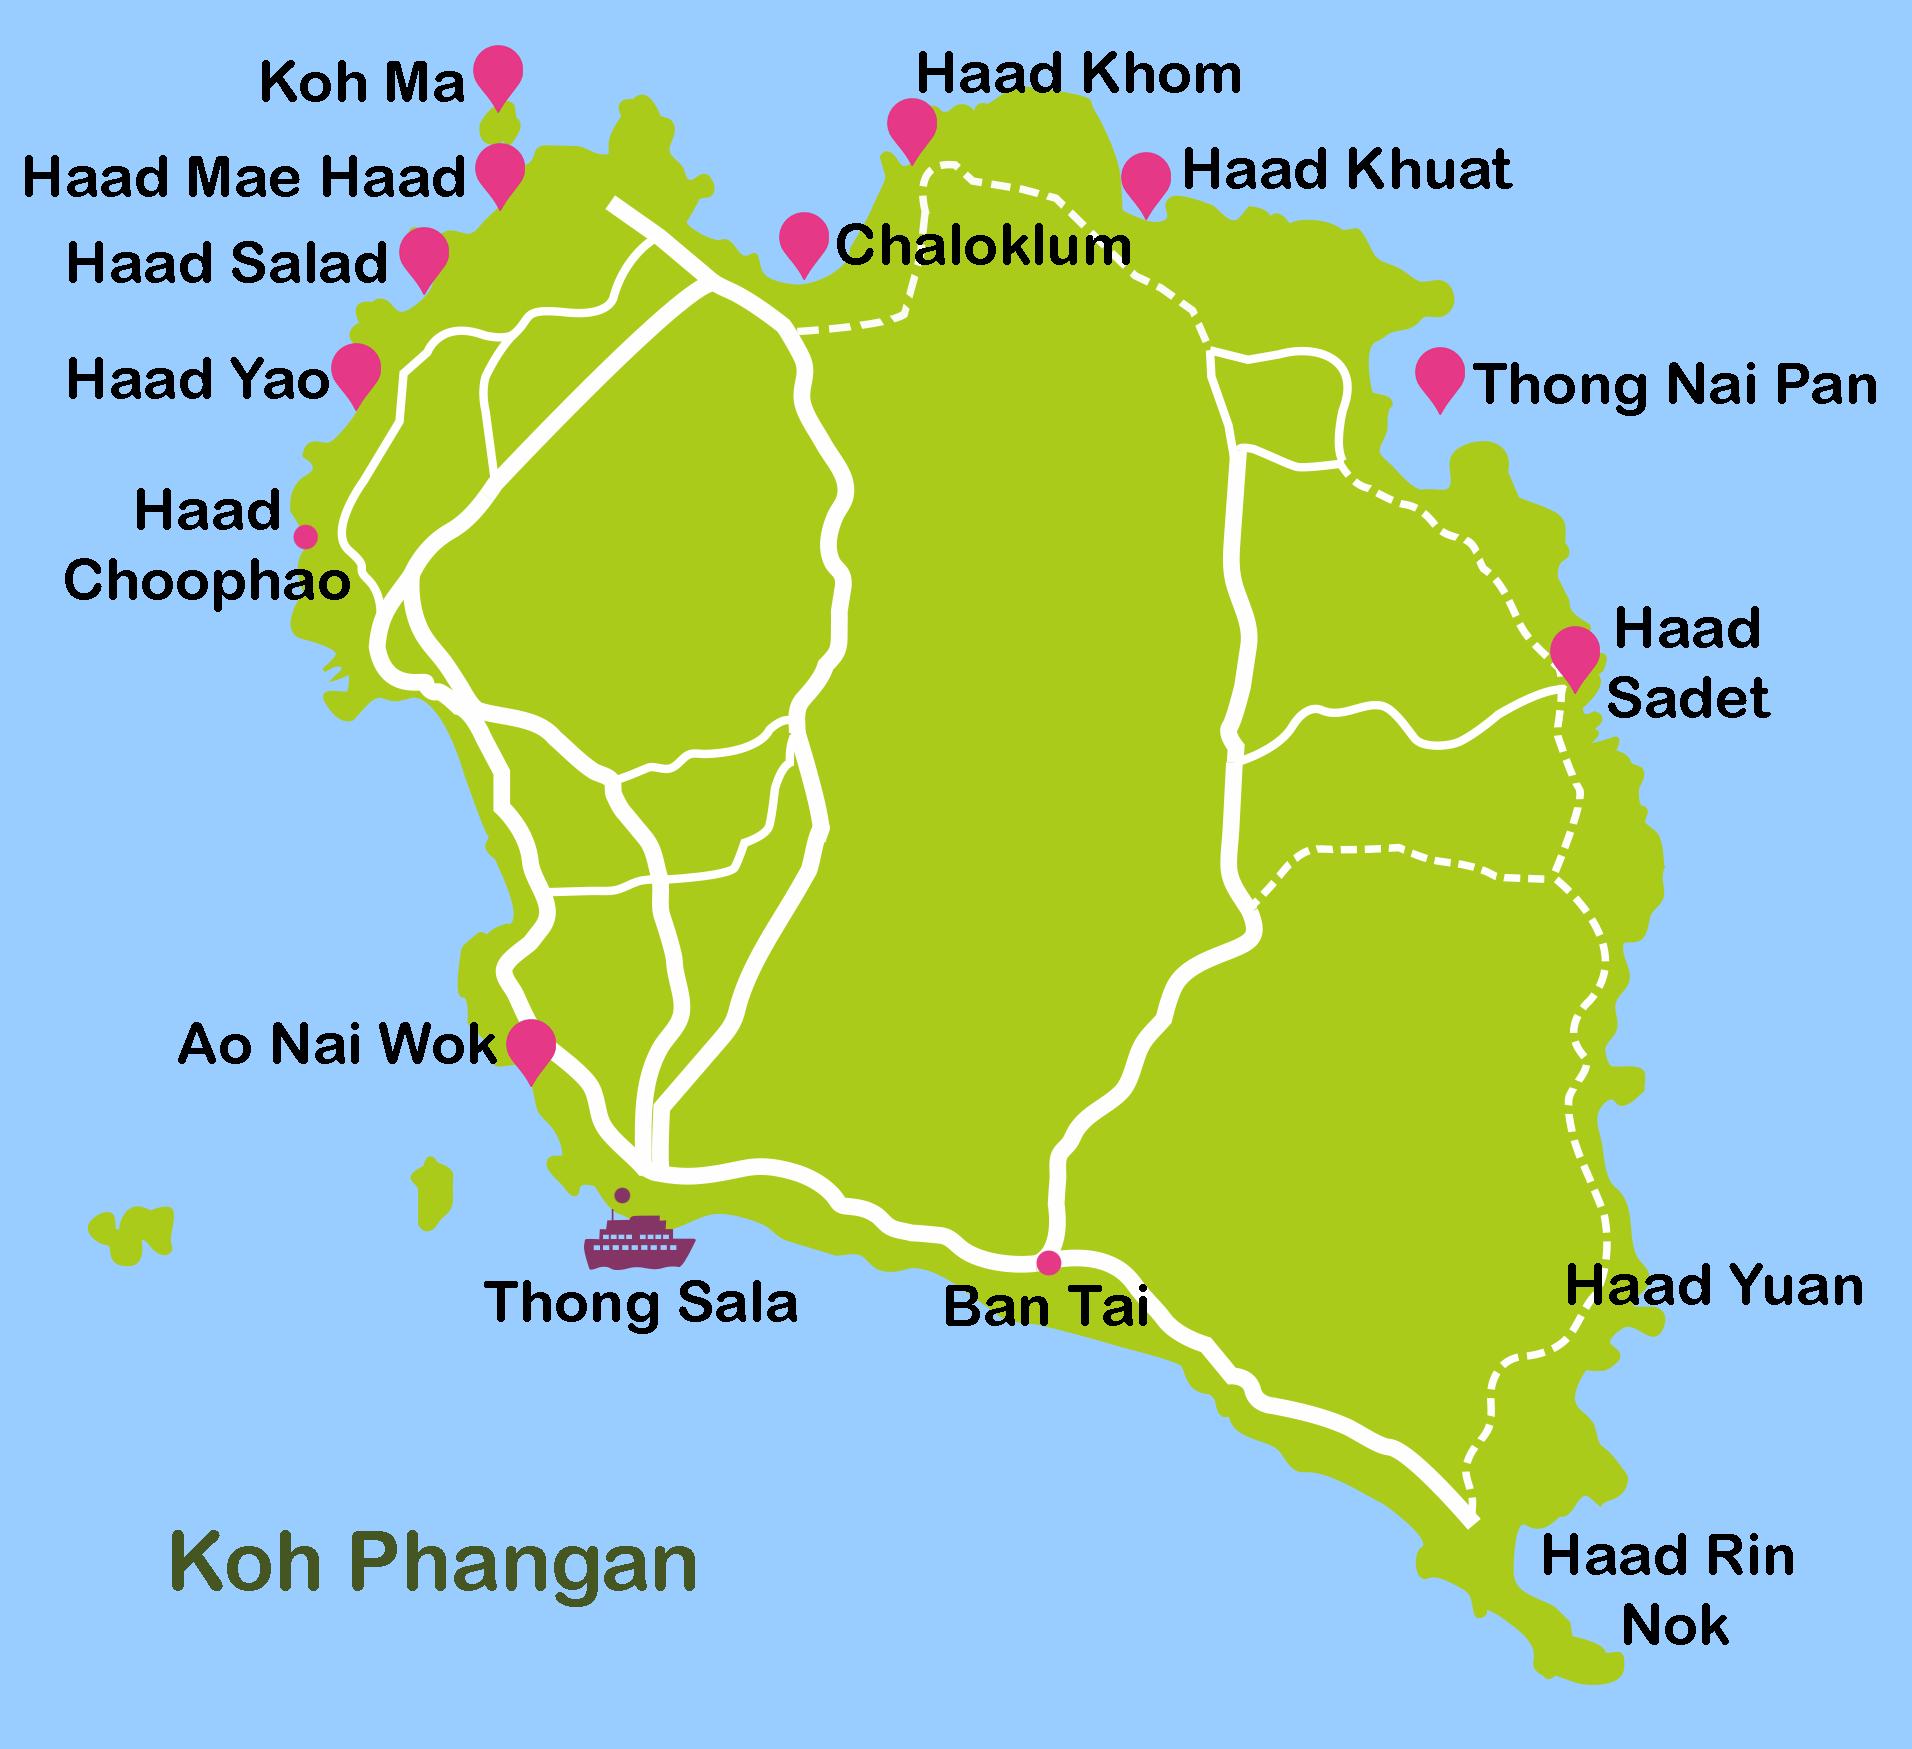 Mapa_12. Koh Phangan